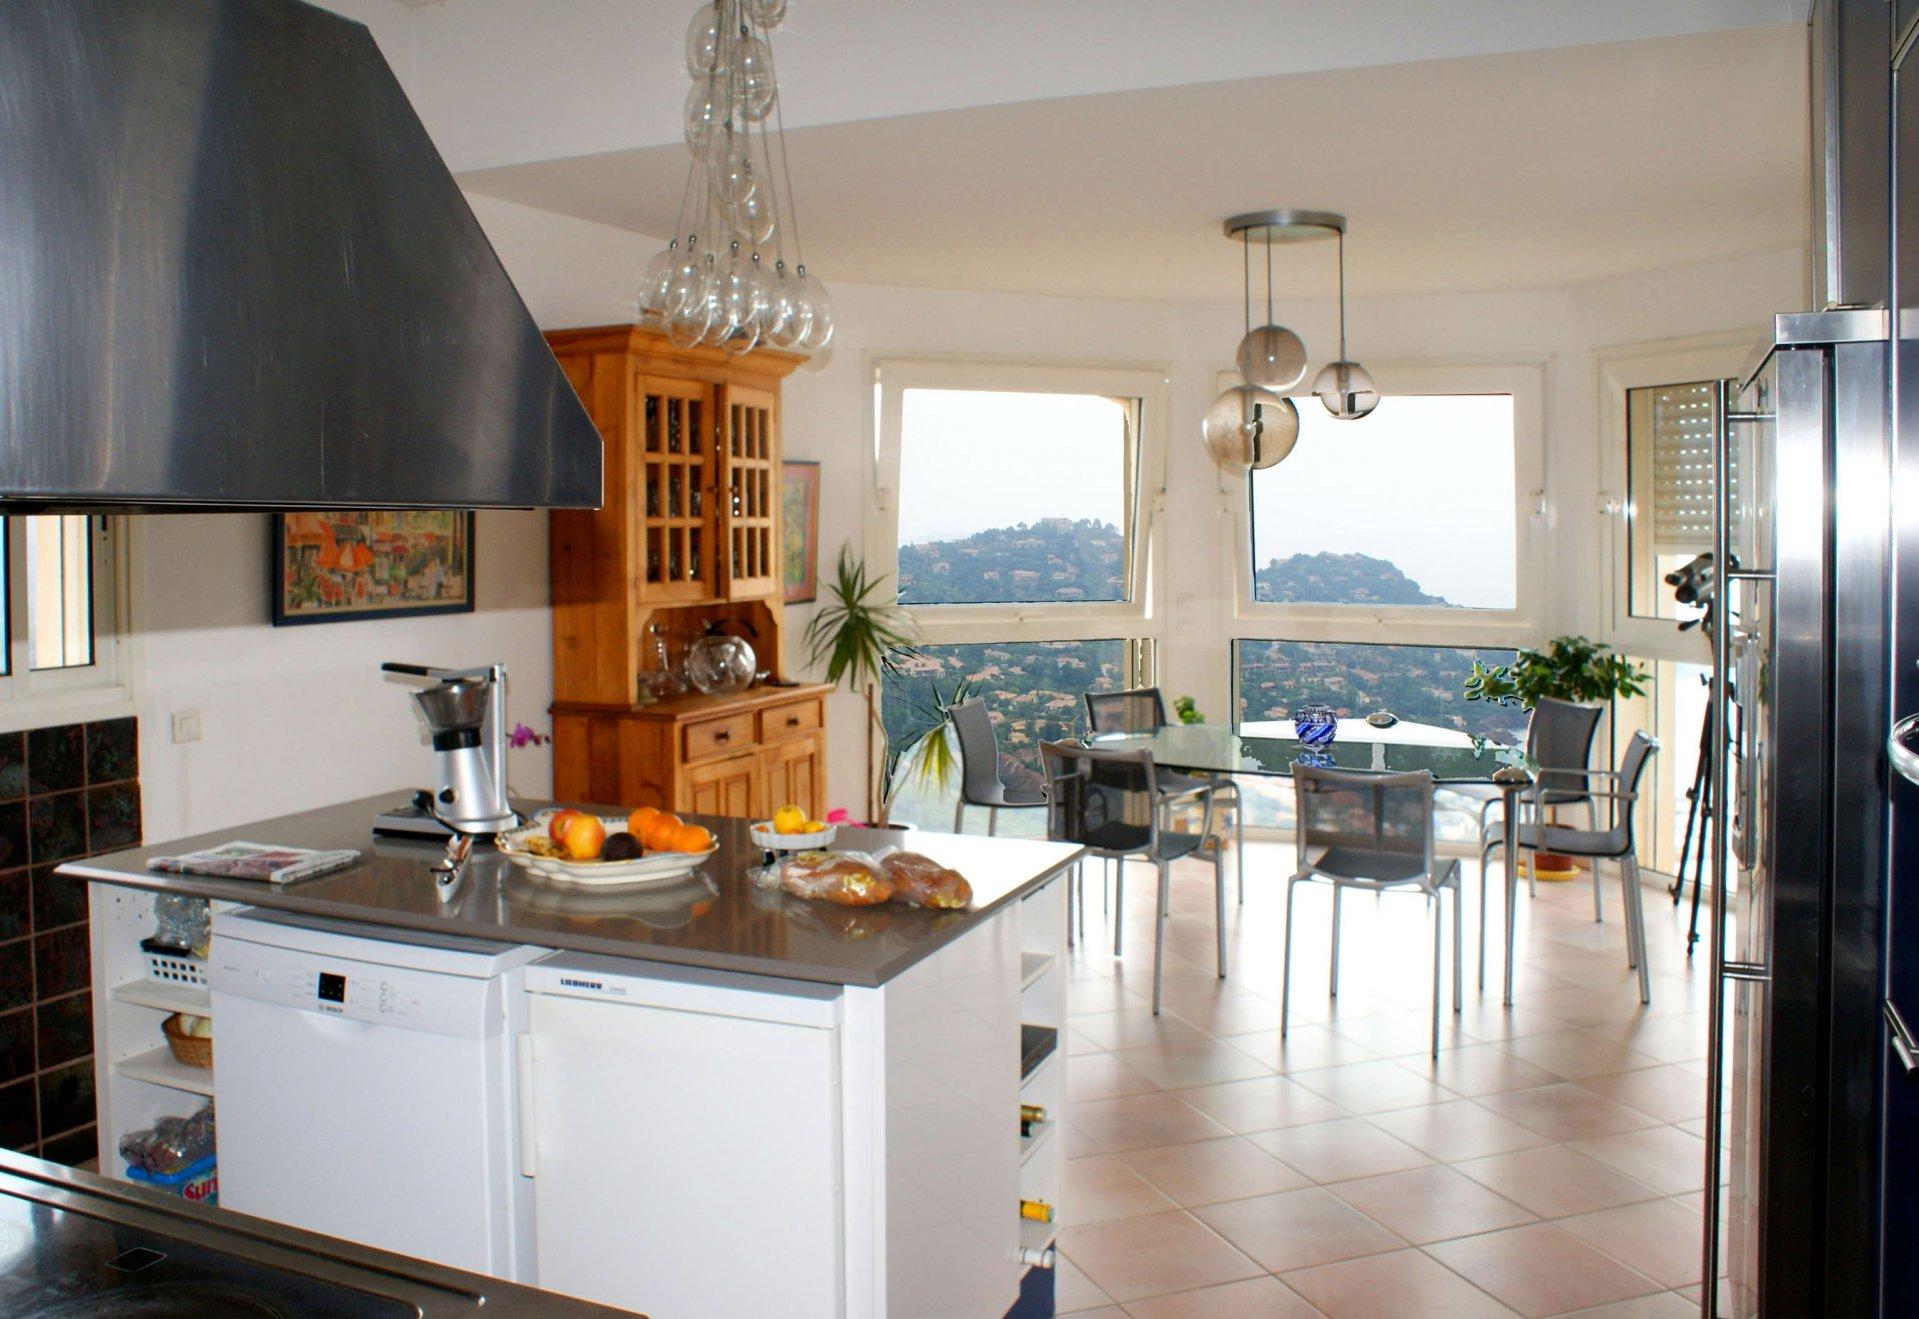 Chandelier, natural light, stainless steel, kitchen island